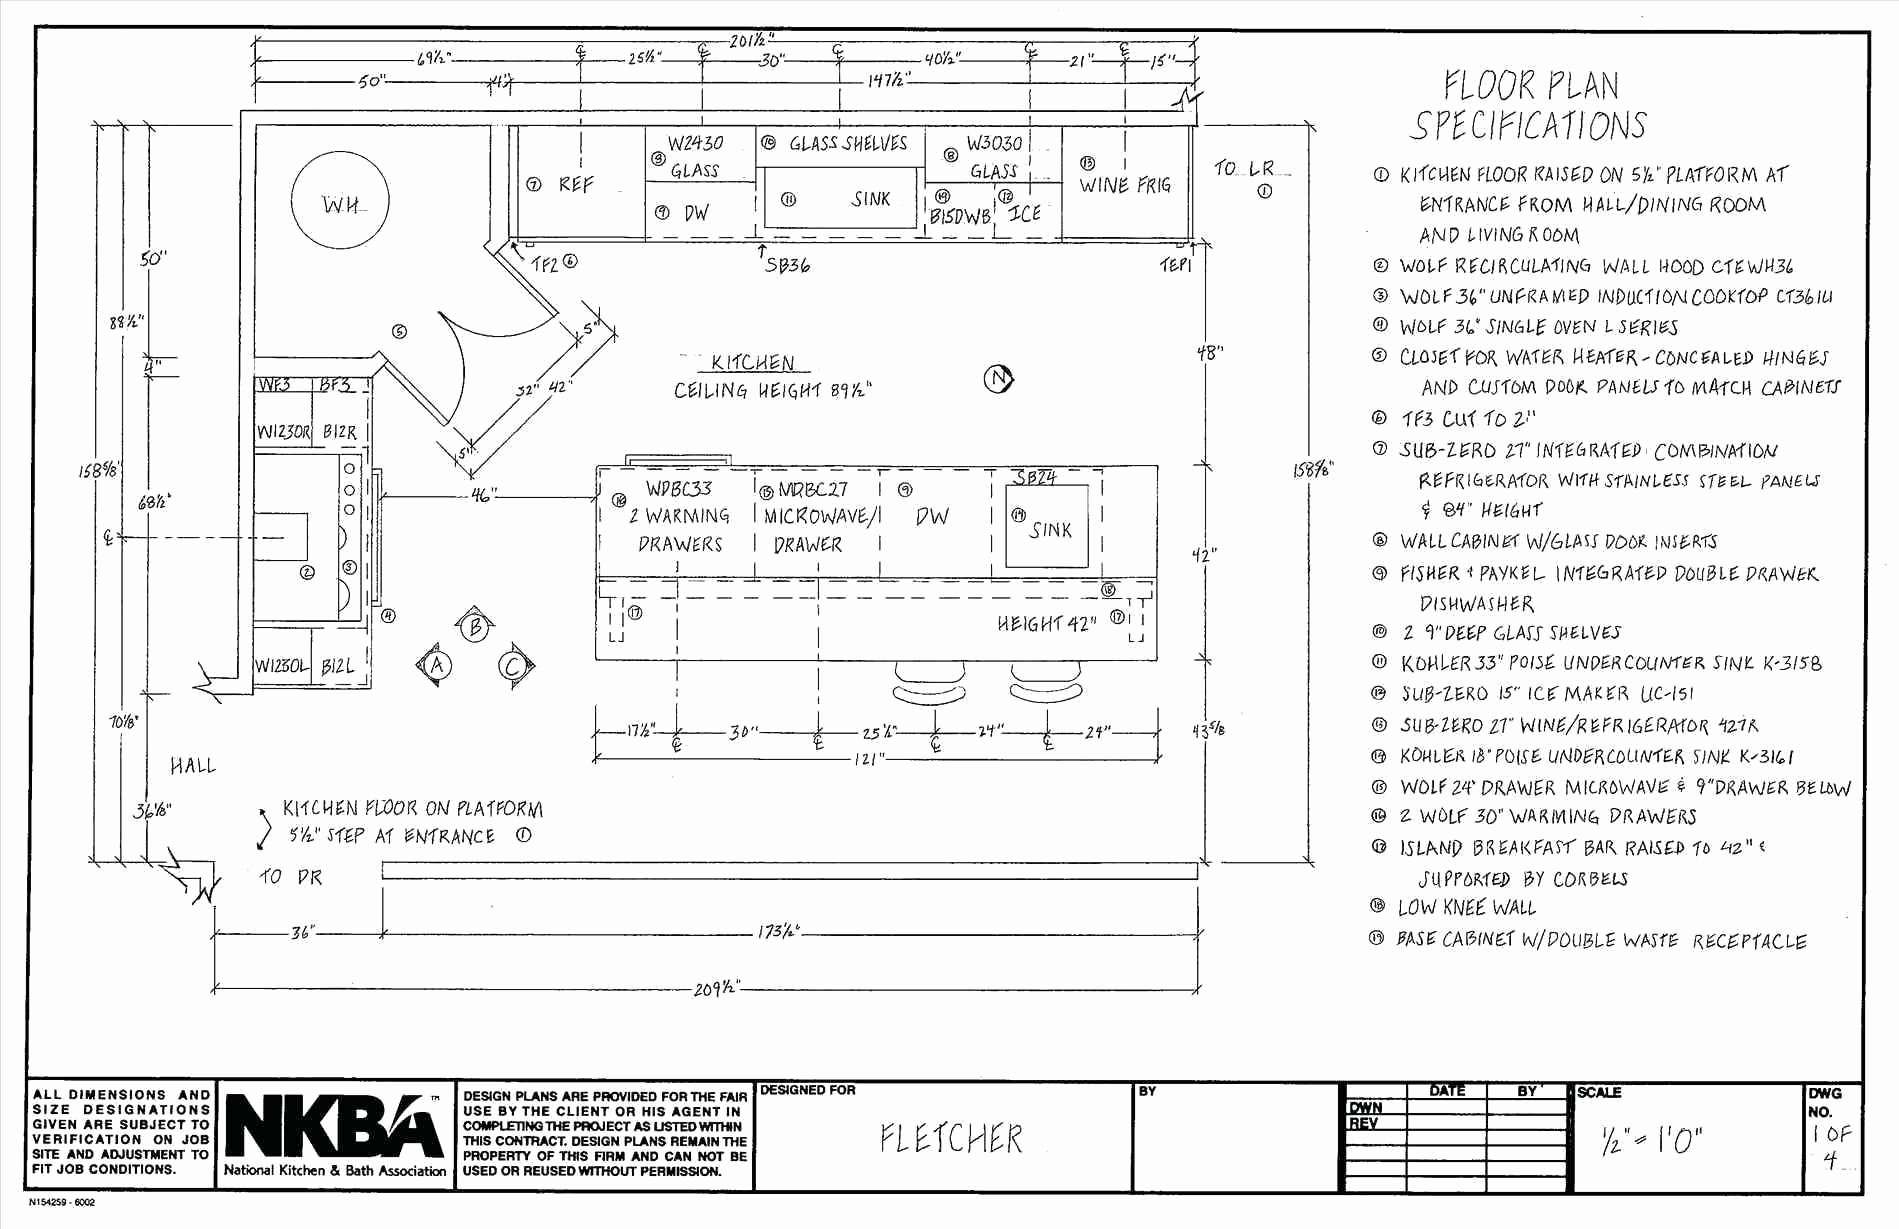 Bathroom Remodel Project Plan Template Unique Template Home Renovation Project Plan Template